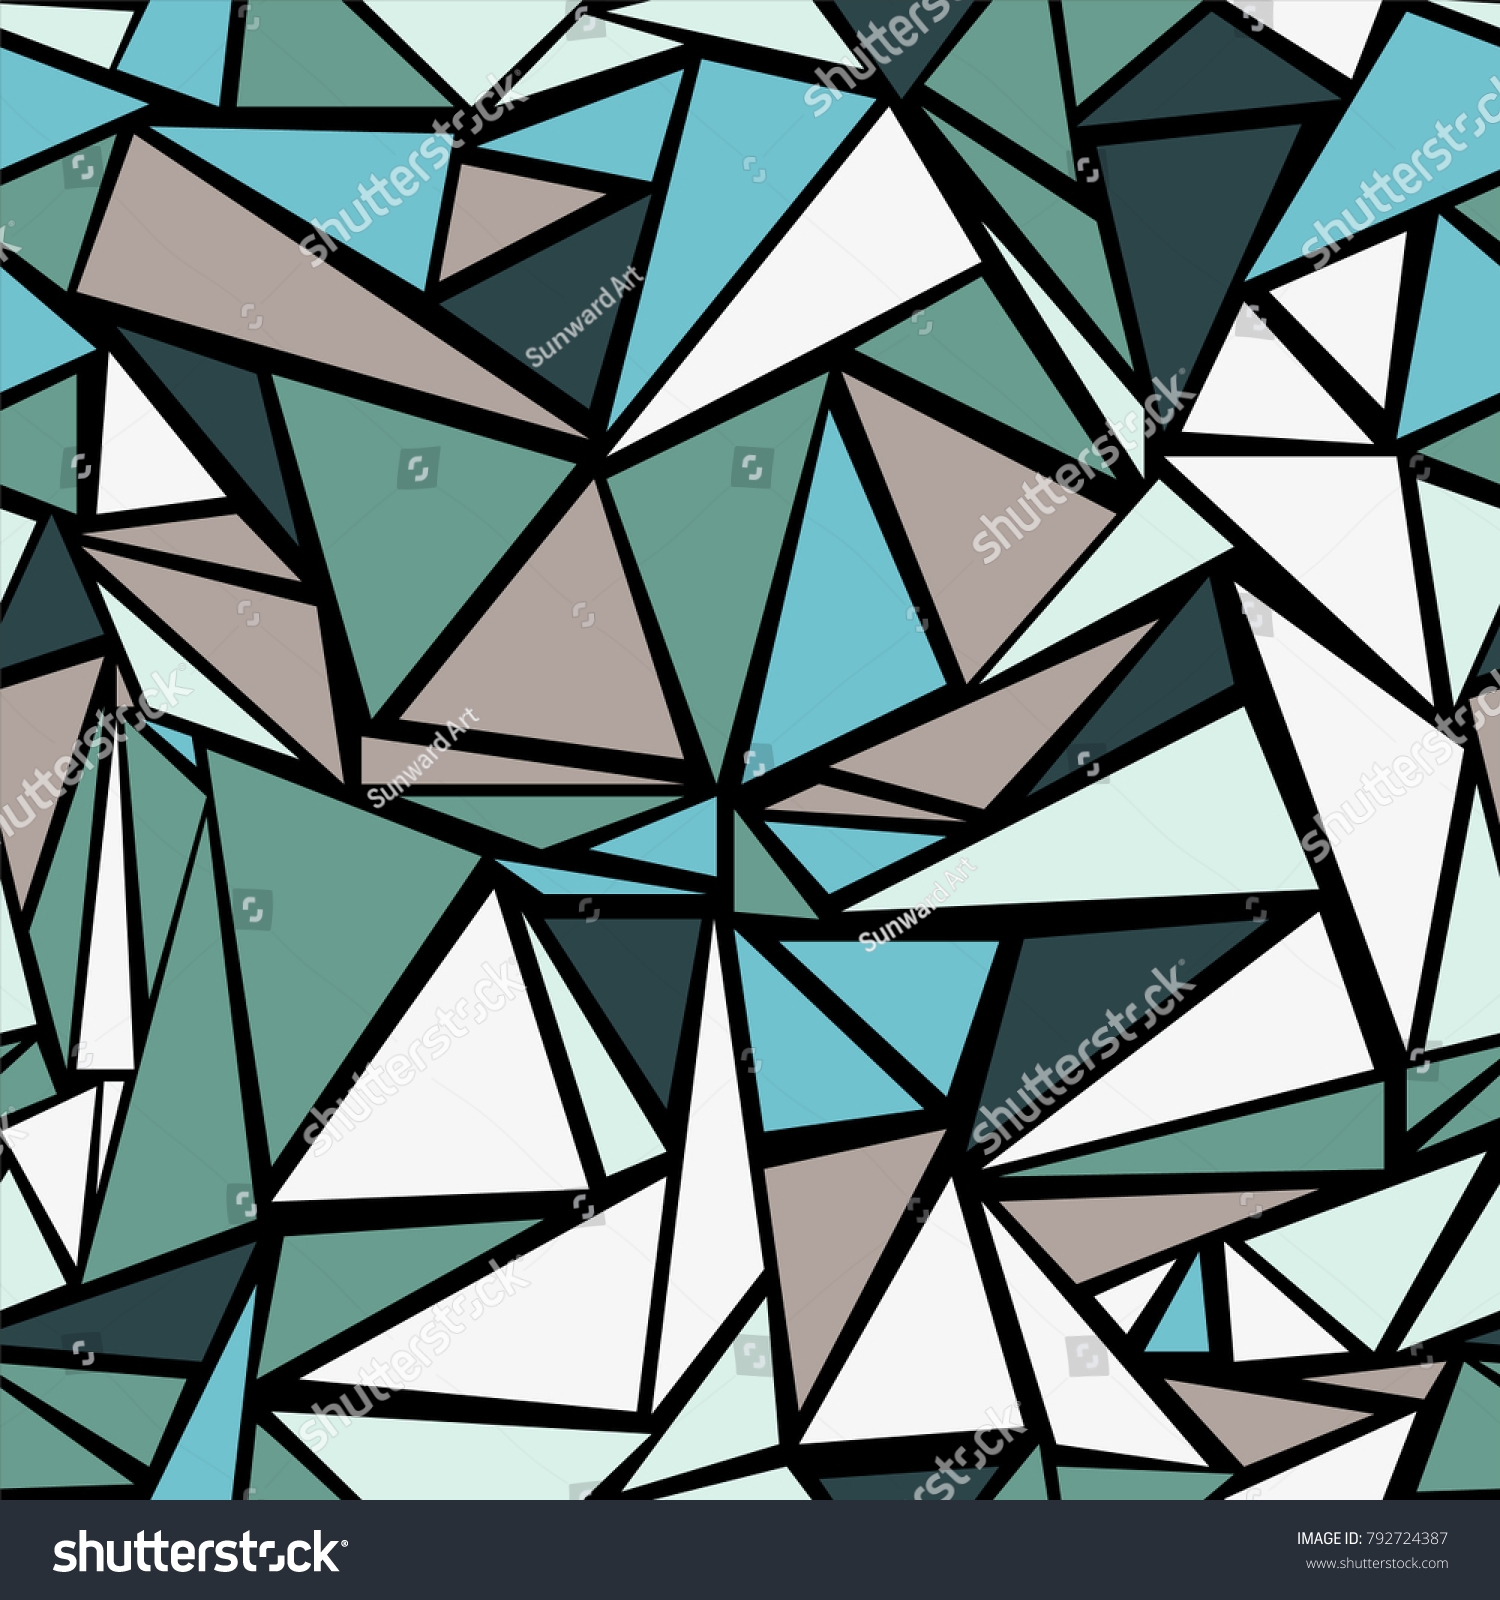 tech triangular grid geometric seamless background stock vector Spanish ID tech triangular grid geometric seamless background minimal triangles polygonal texture diamond triangle brochure minimal